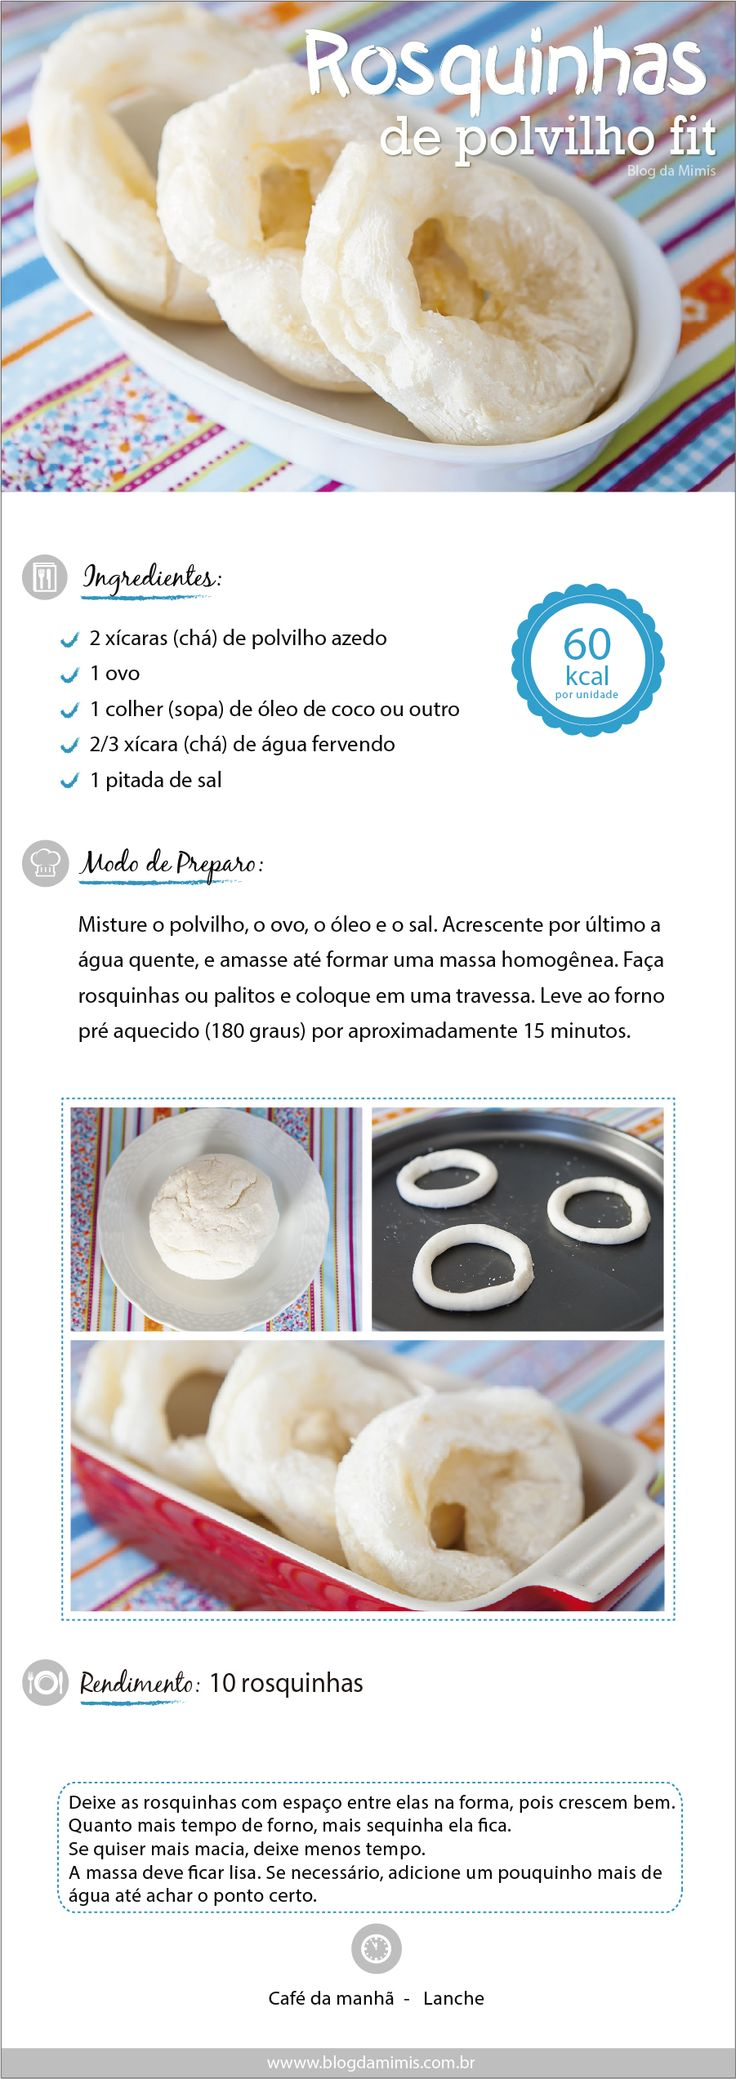 rosquinha-fit-post-blog-da-mimis-michelle-franzoni-1